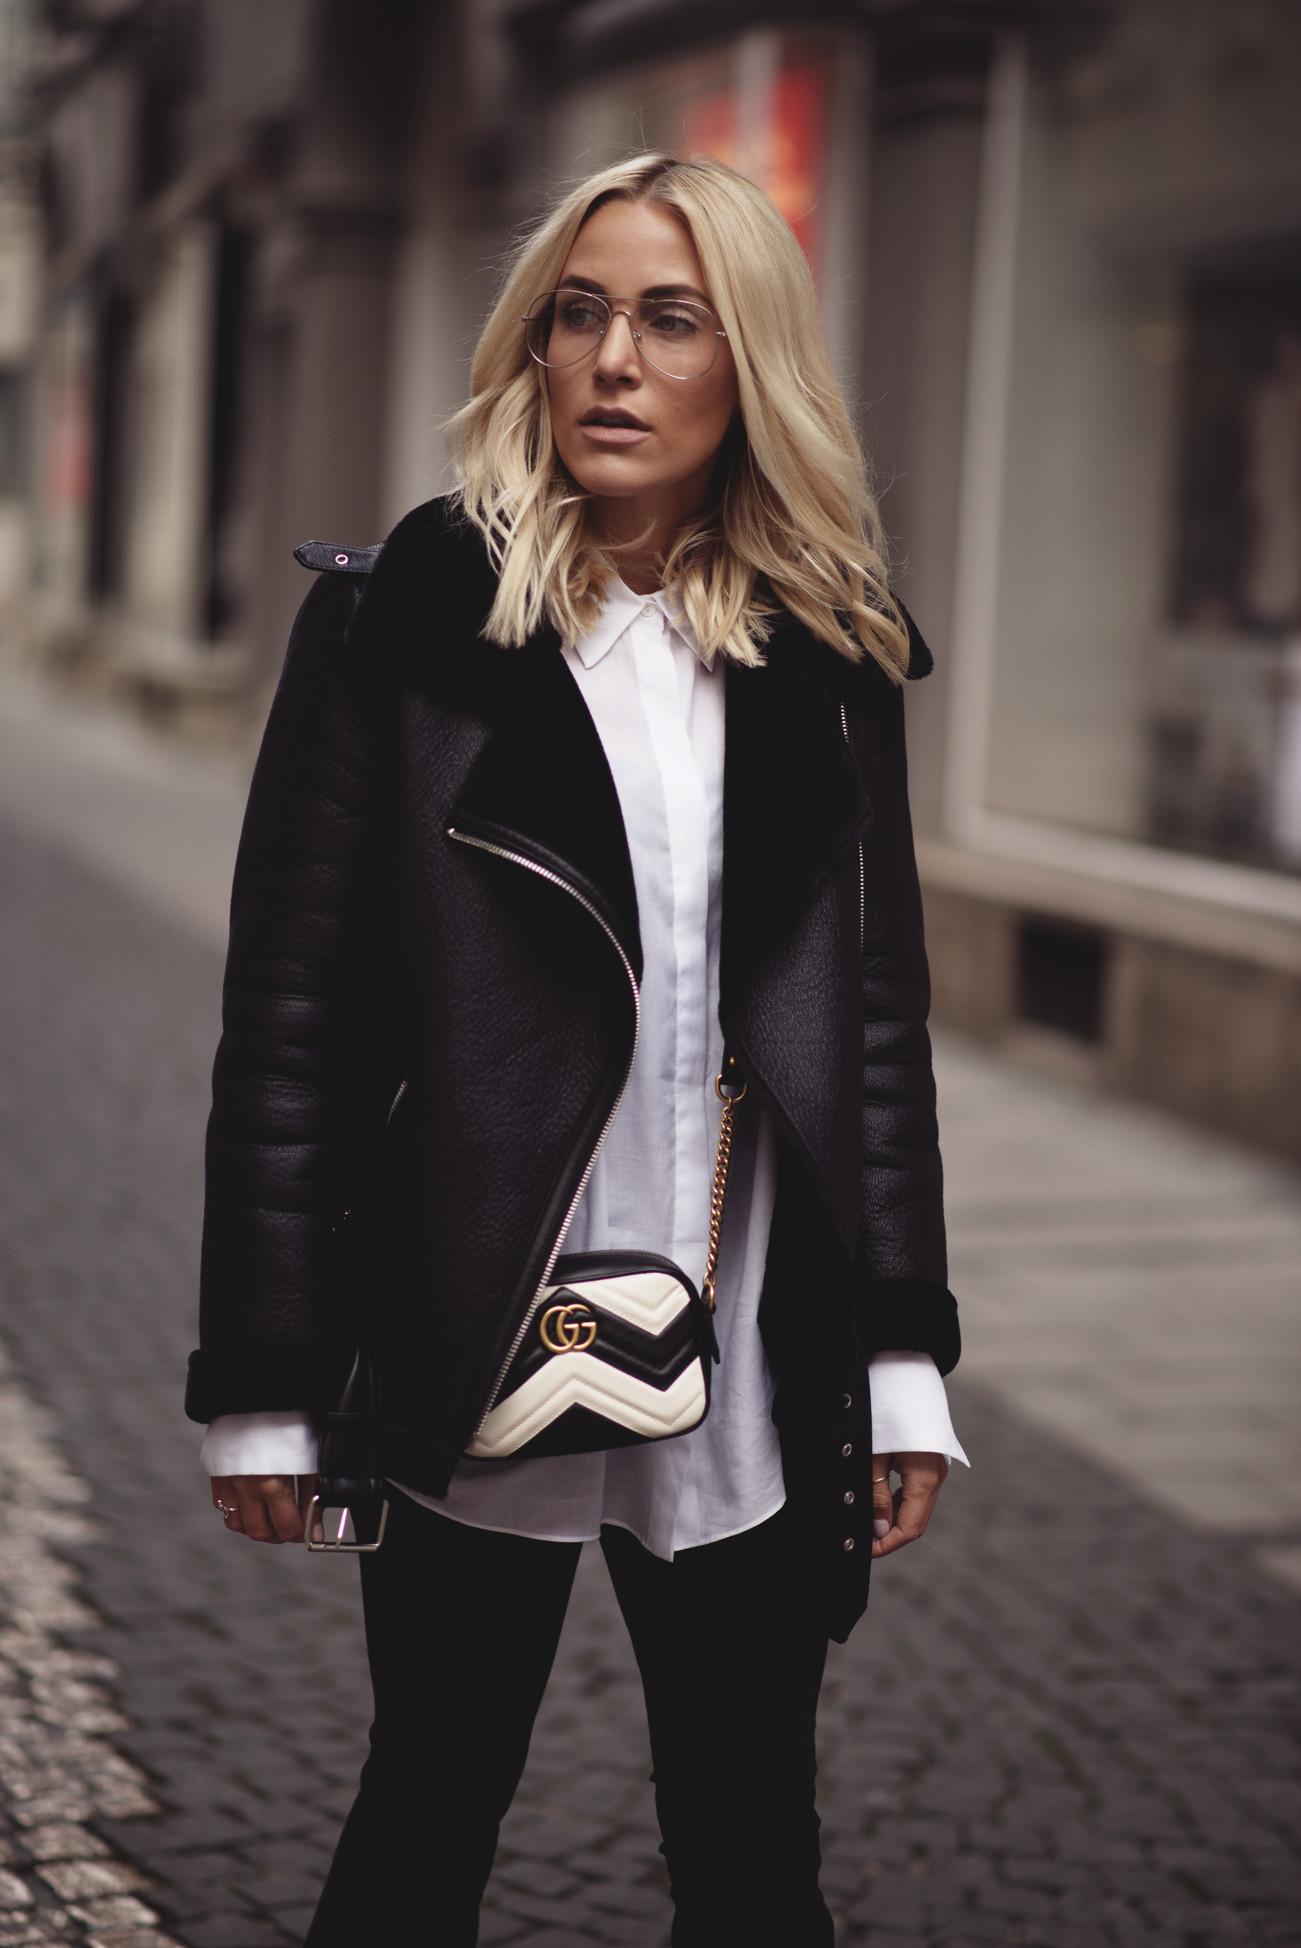 guccimarmont-gucci-fashionblogger-blogger-sequinsophia-munich-7-dsc_2908